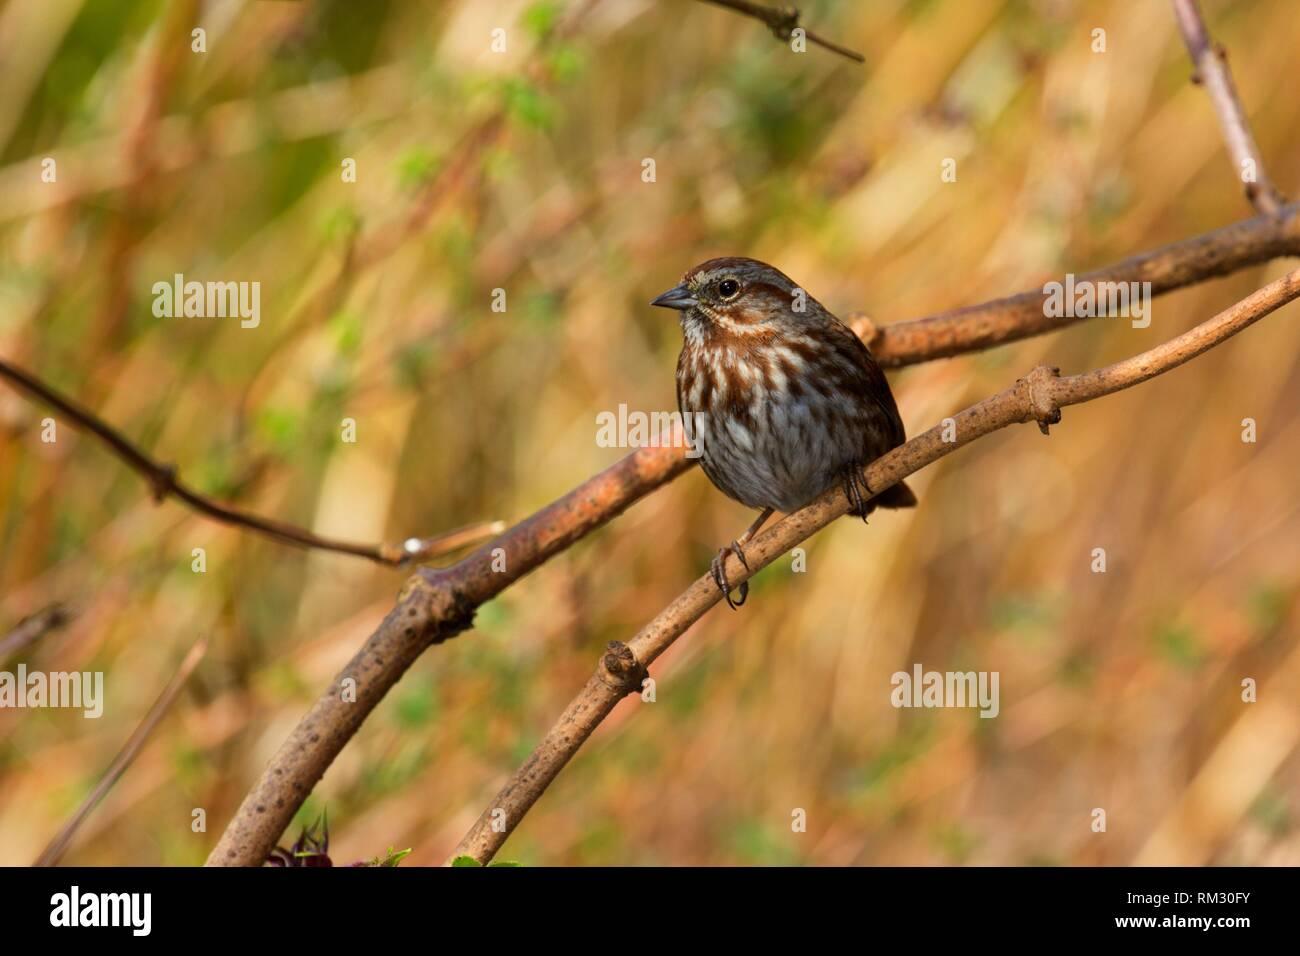 Sparrow, Jackson Bottom Wetlands Preserve, Hillsboro, Oregon. - Stock Image